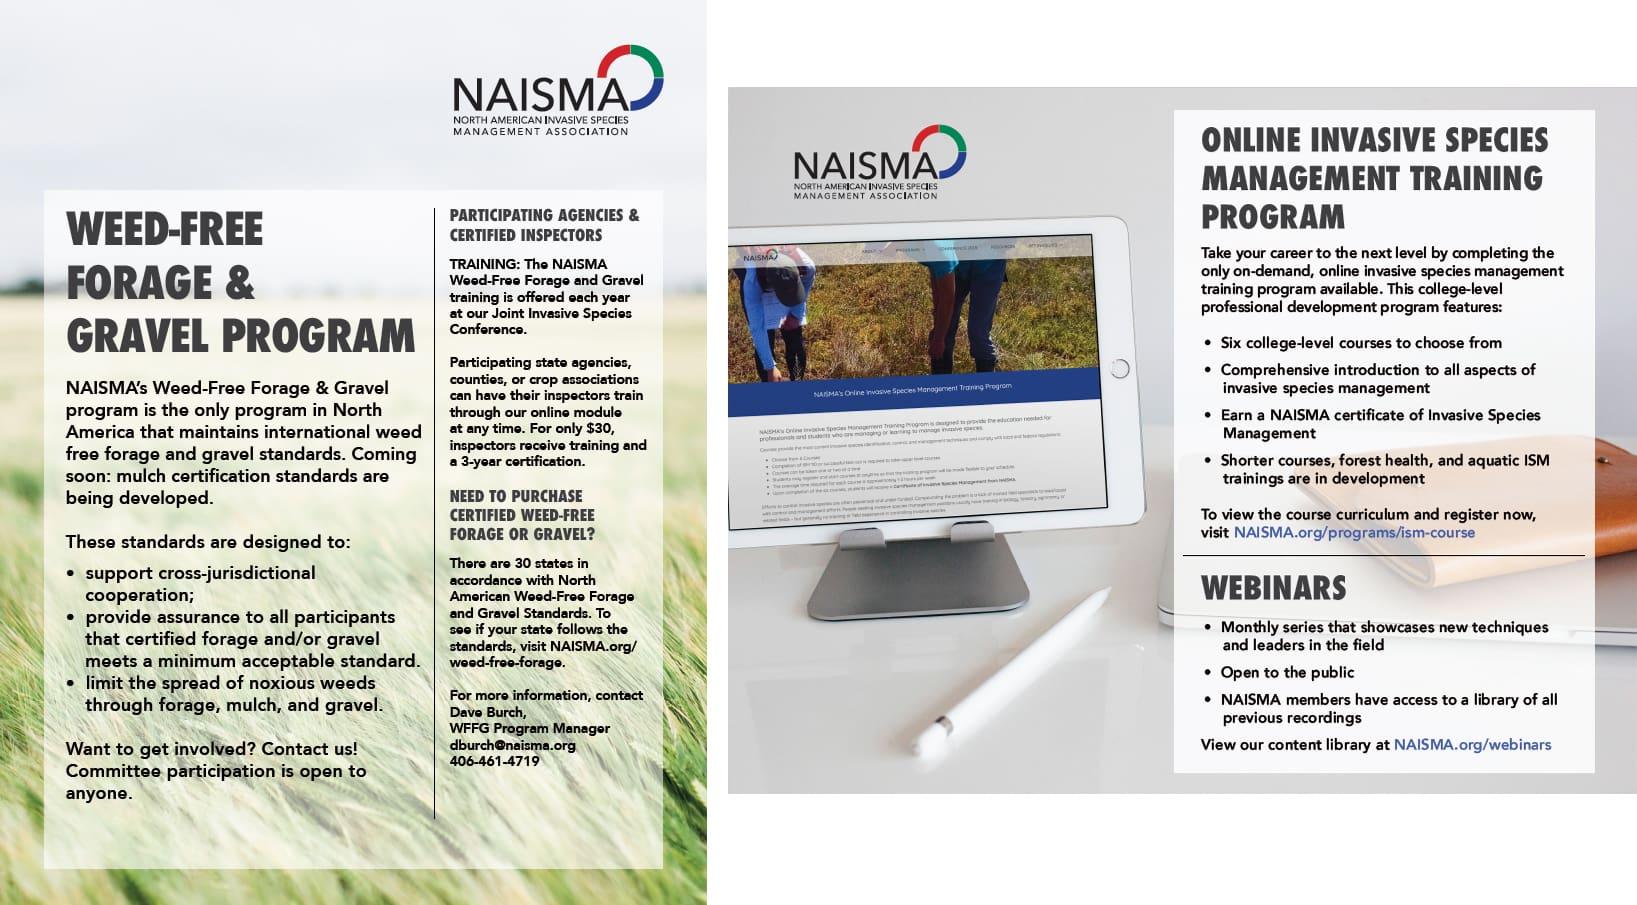 Weed Free Forage Brochure - NAISMA